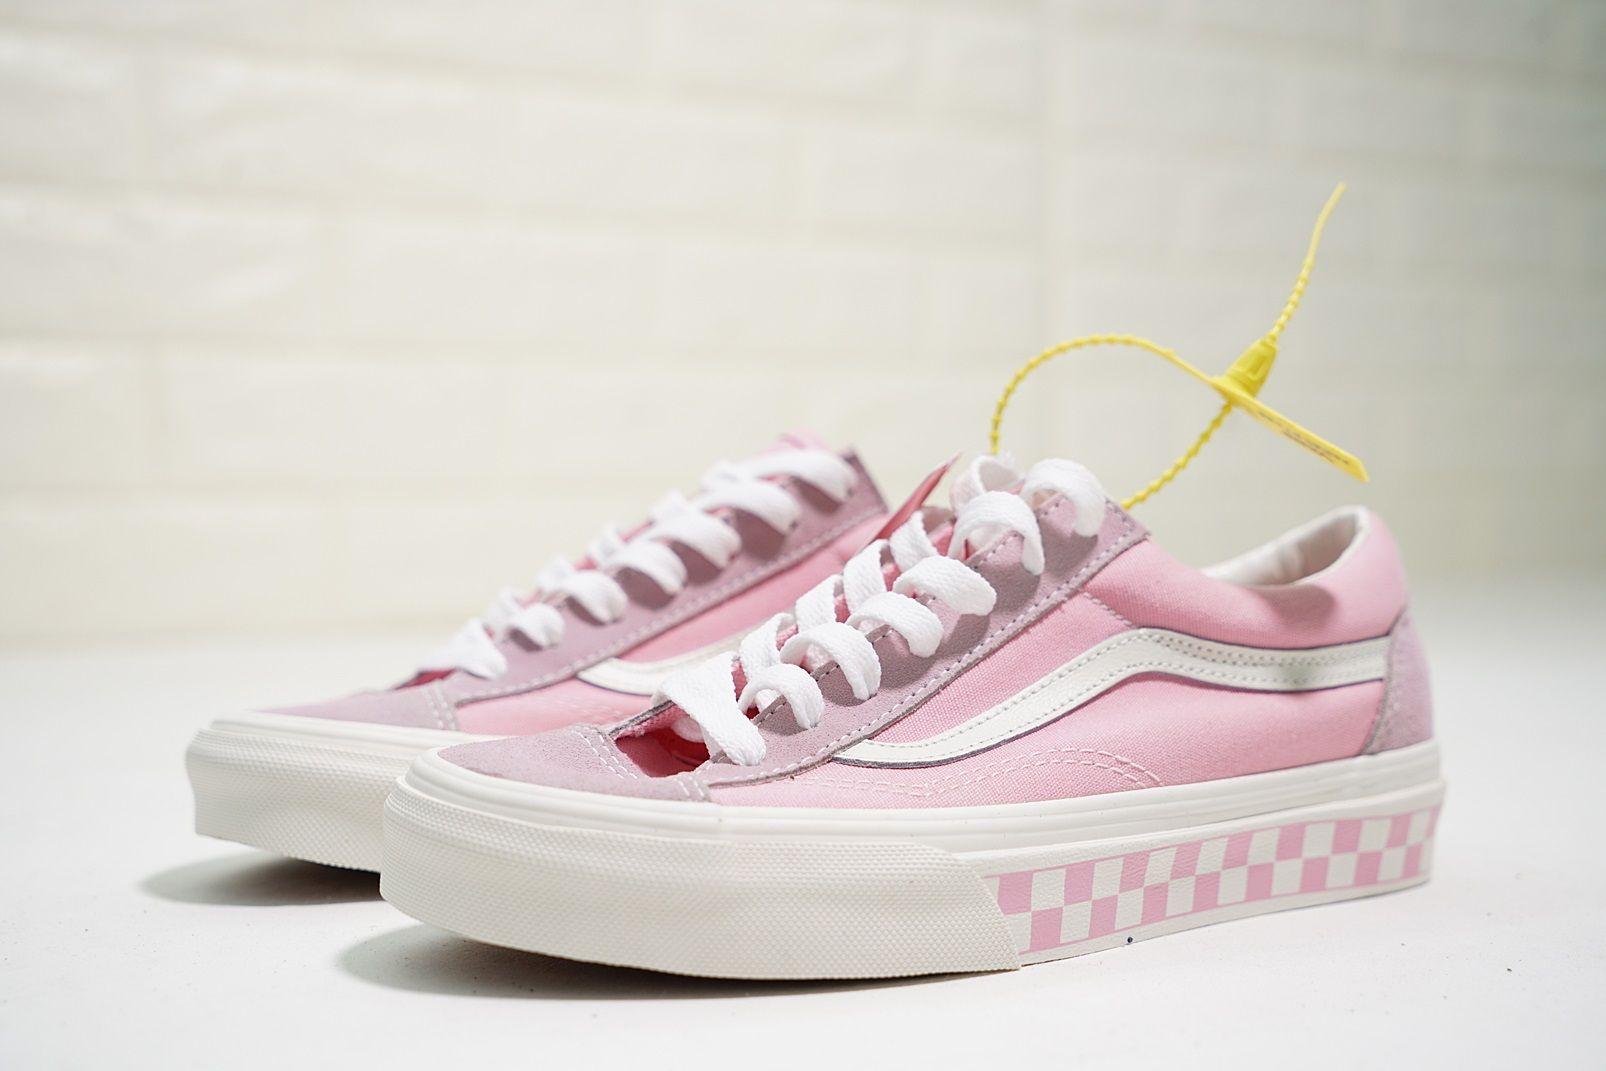 hot sale online 9c5c2 f6d1b vans vault og style 36 grid 日本限定格子底女款滑板鞋粉白